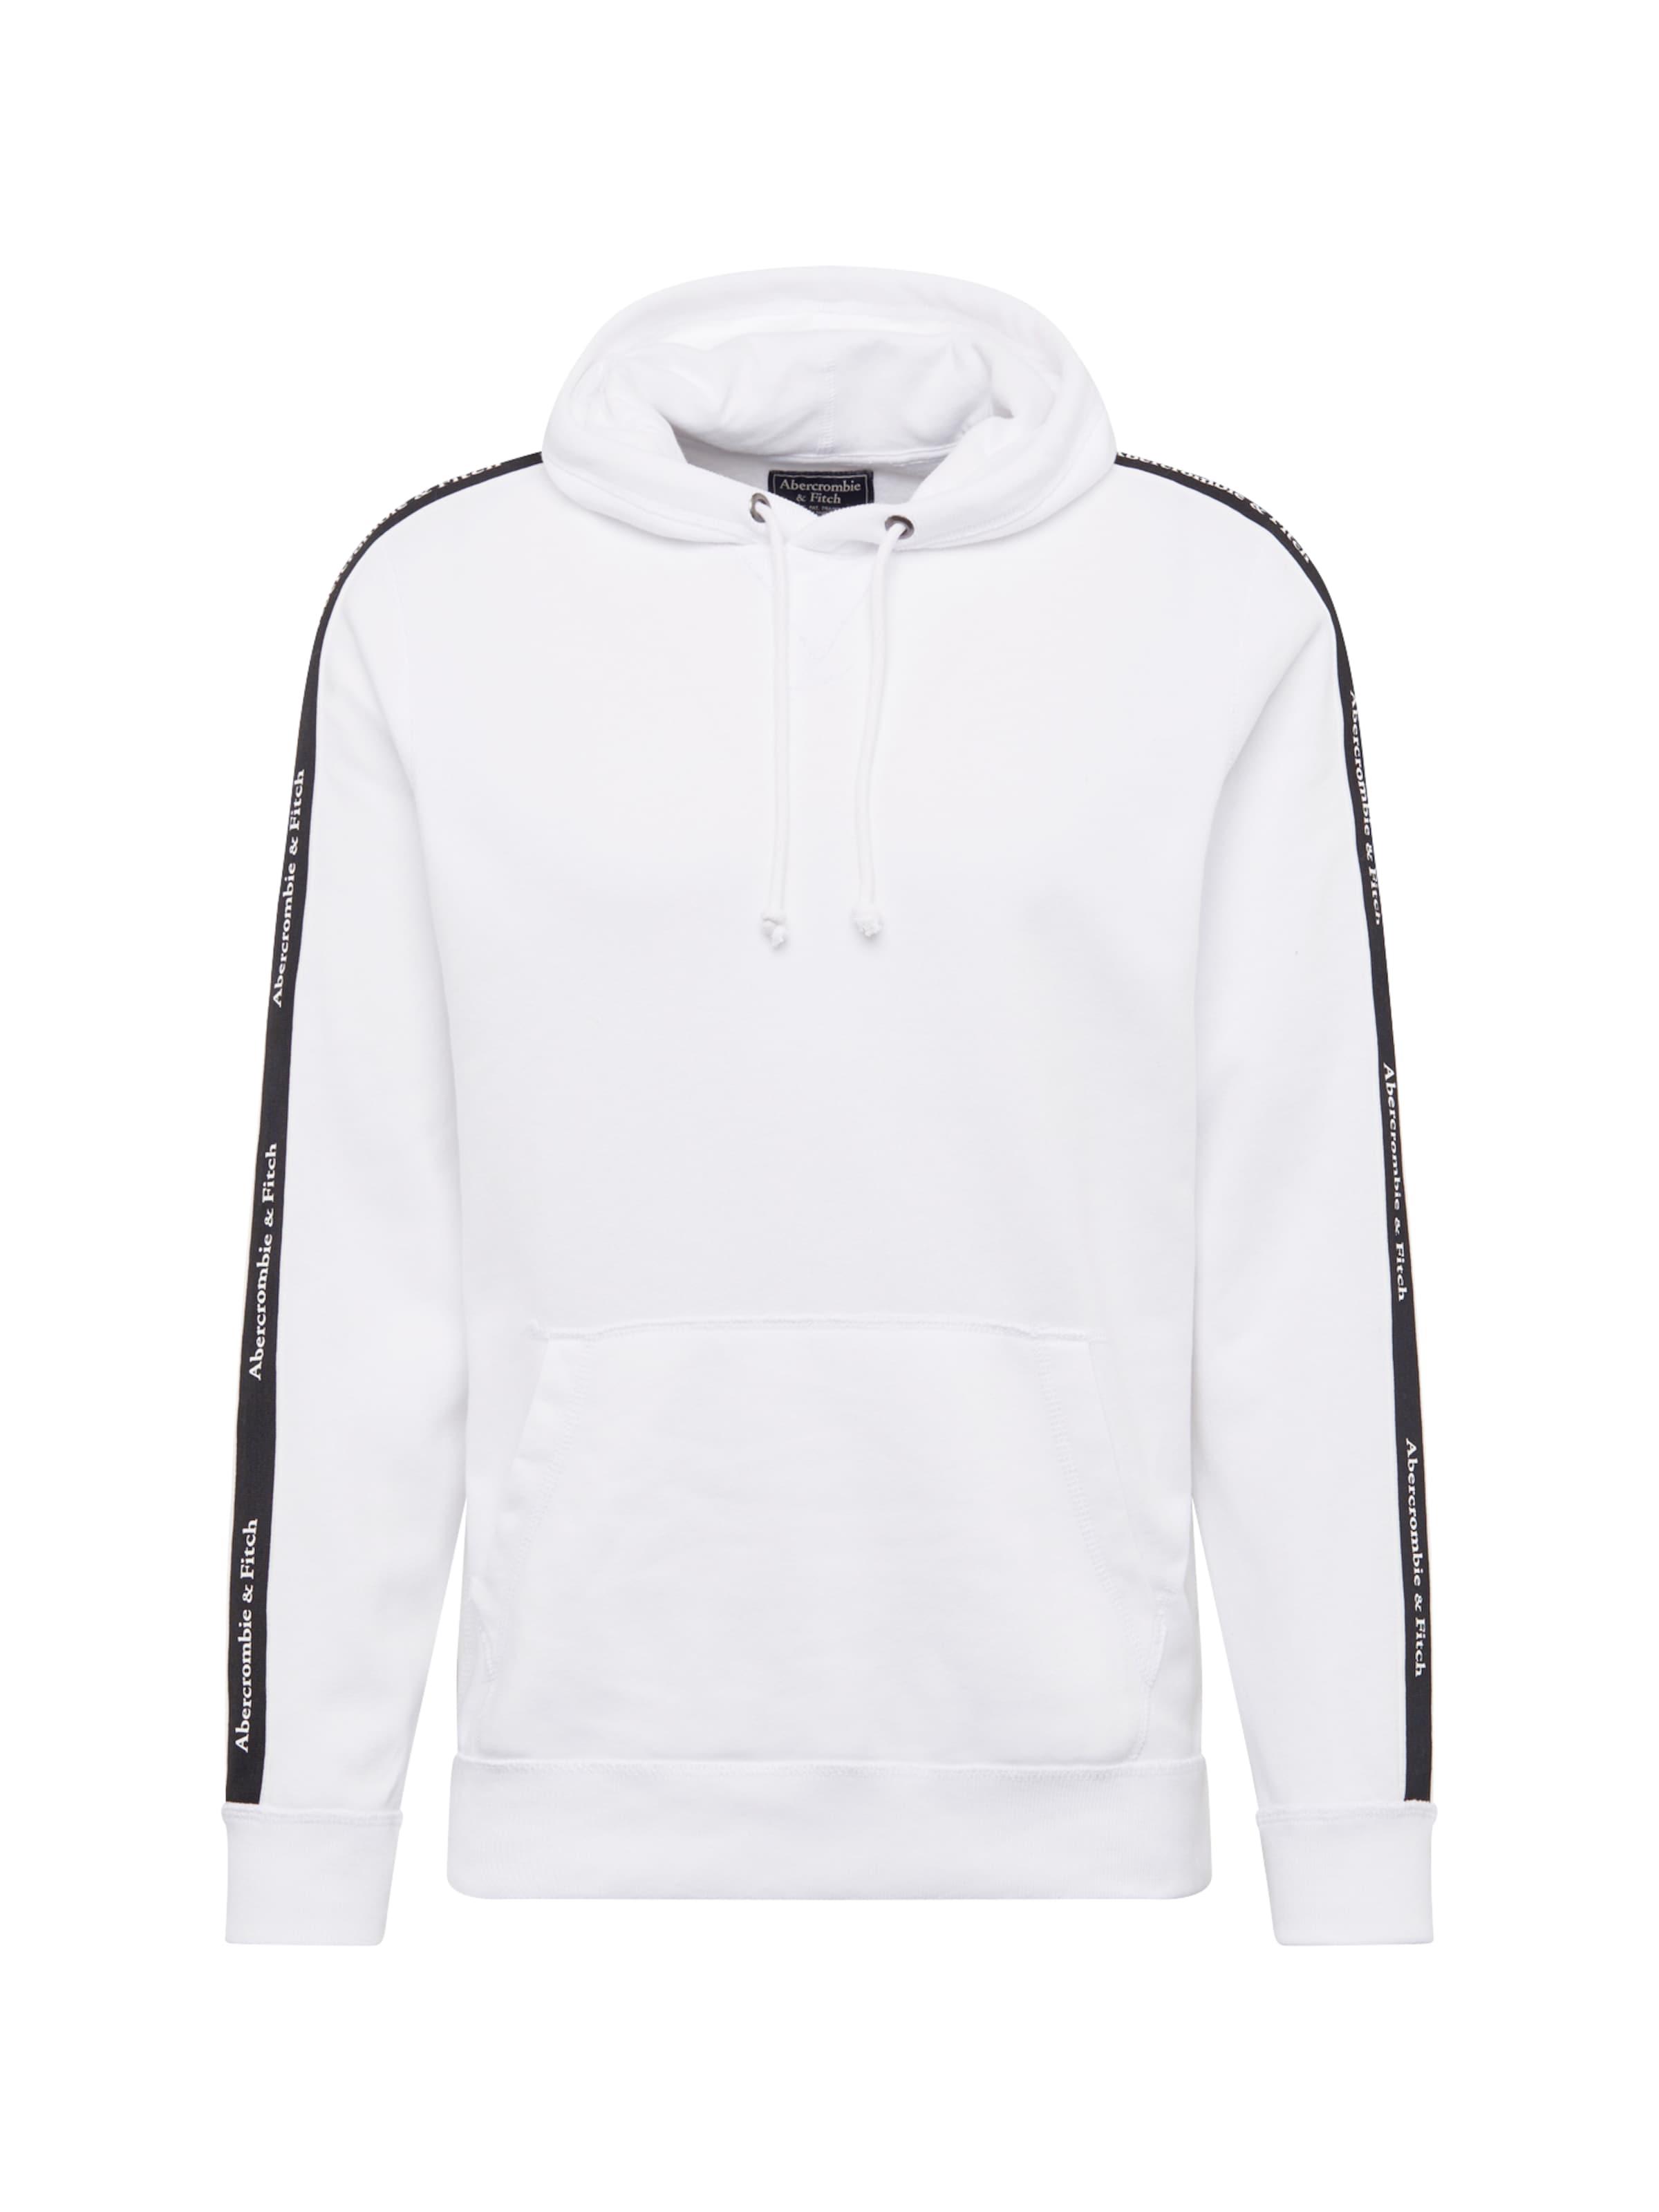 'b Fitch Sweatshirt Abercrombieamp; SchwarzWeiß In w' 4AR35jqL